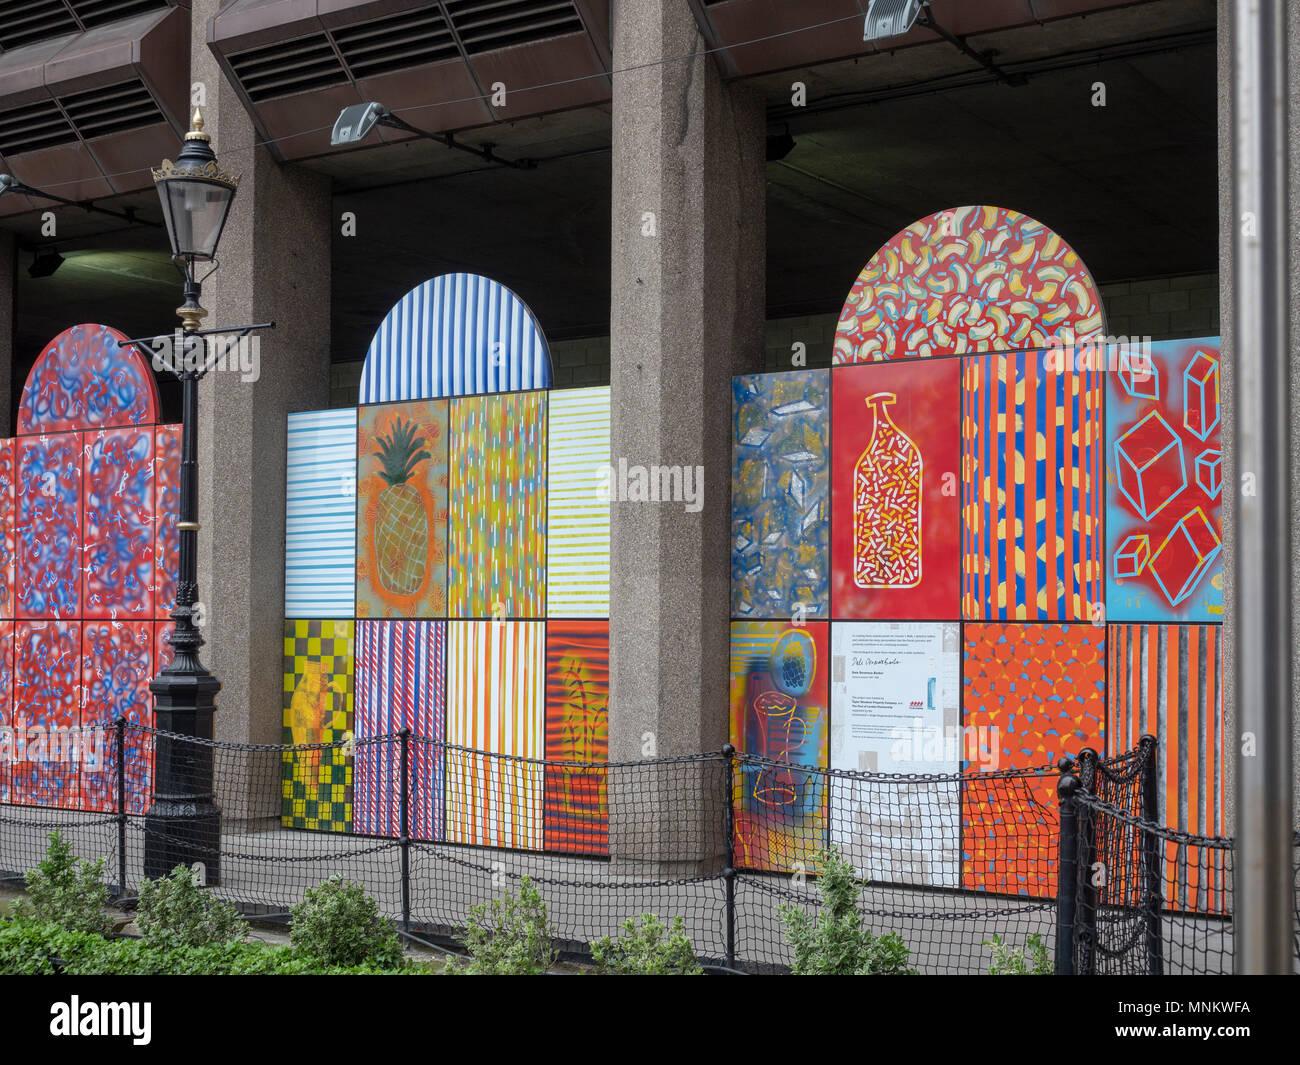 Vitreous enamel panels by artist Dale Devereux Barker, 1998 – Taylor Woodrow Properties, Clositer's Walk, St. Katherine's Docks, London, UK. - Stock Image